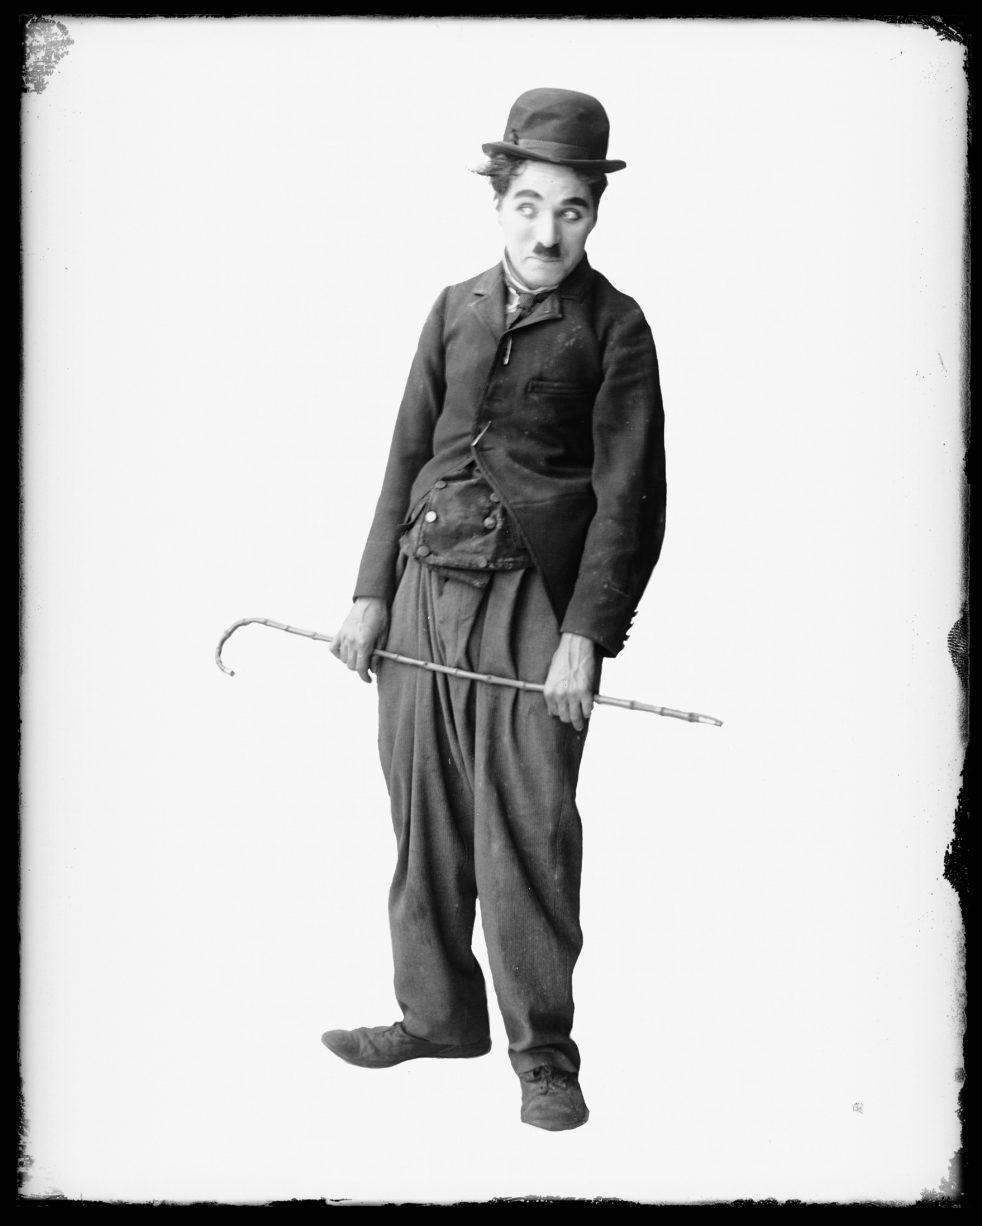 An image of Charlie Chaplin.